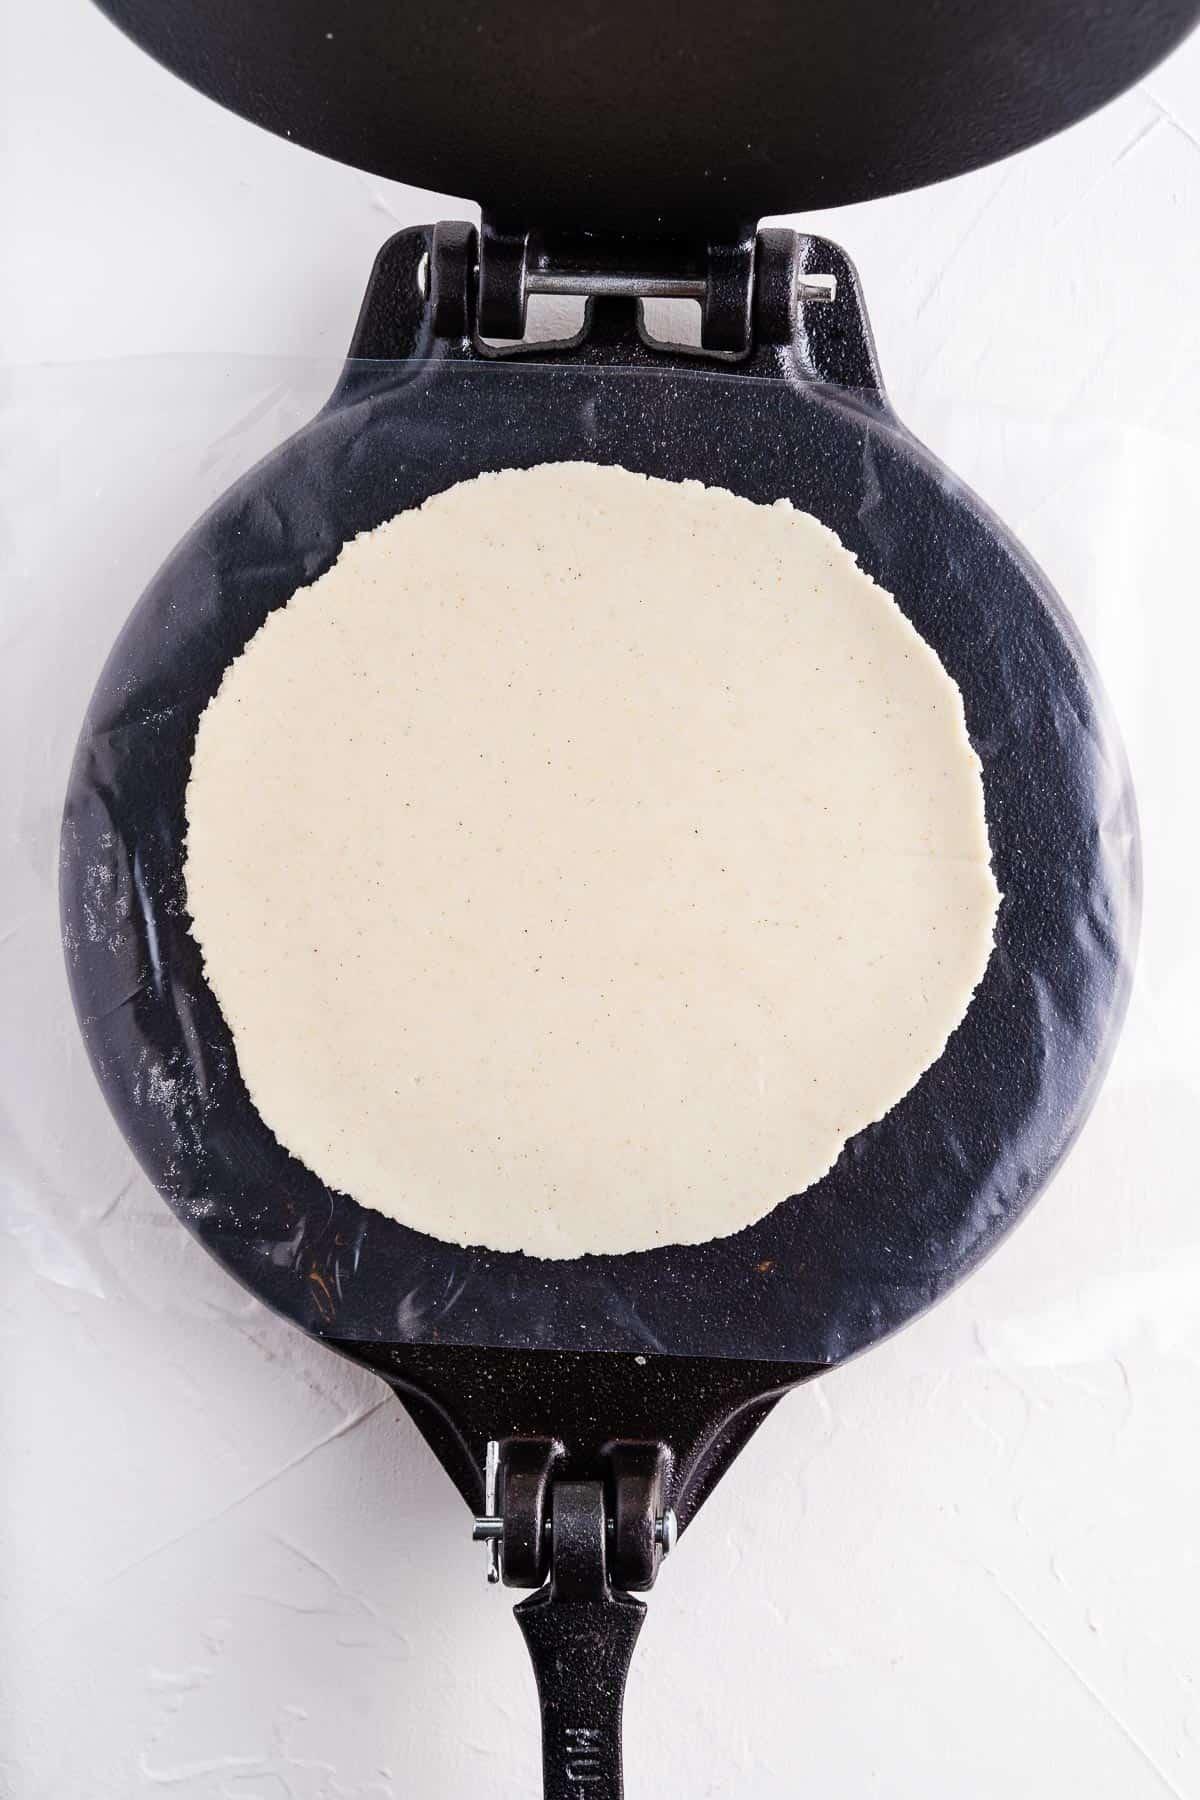 Tortilla in a Press